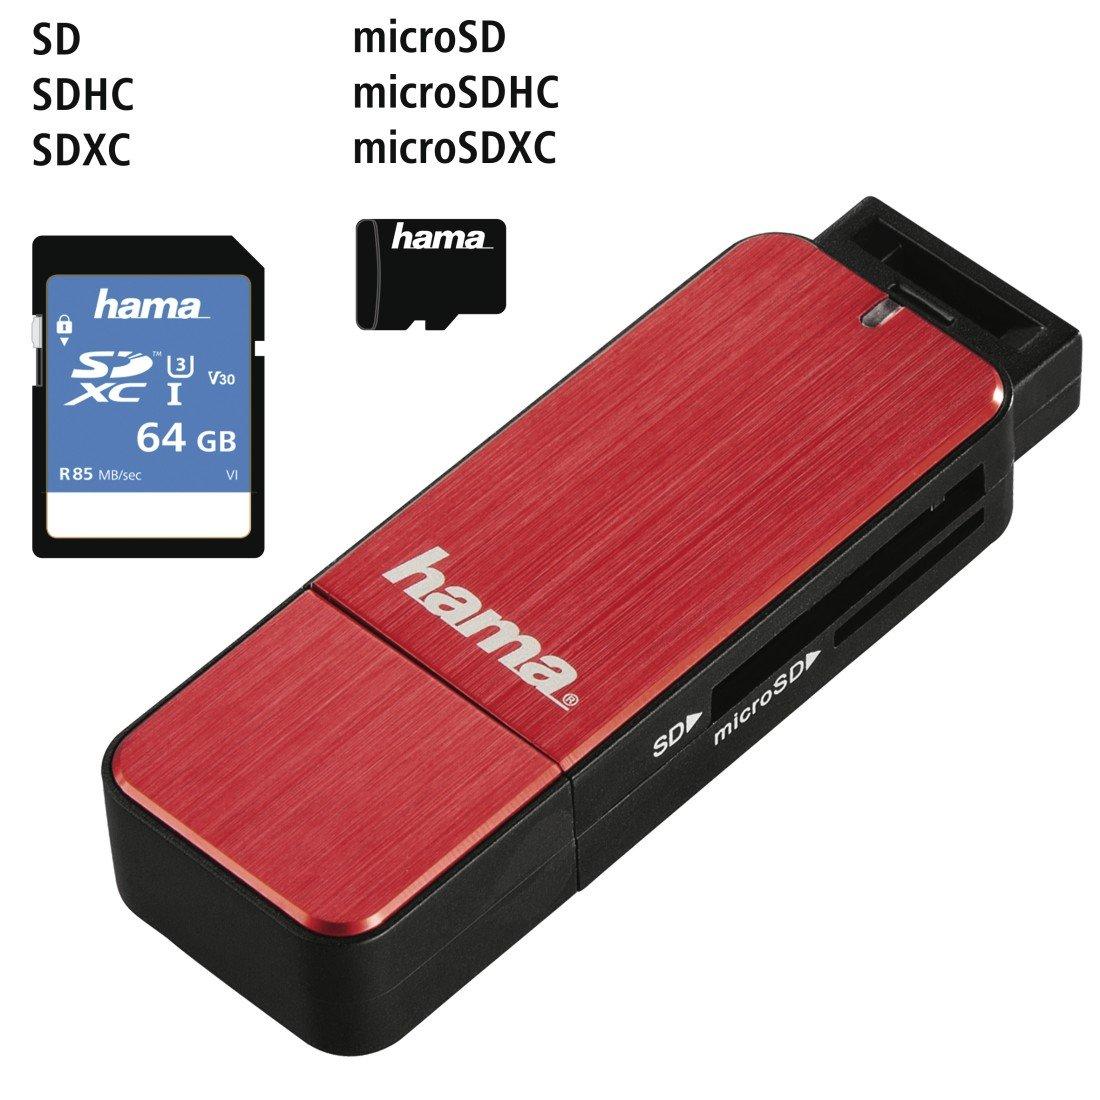 Lector de tarjetas externo SD, MicroSD, USB 3.0 Hama color negro